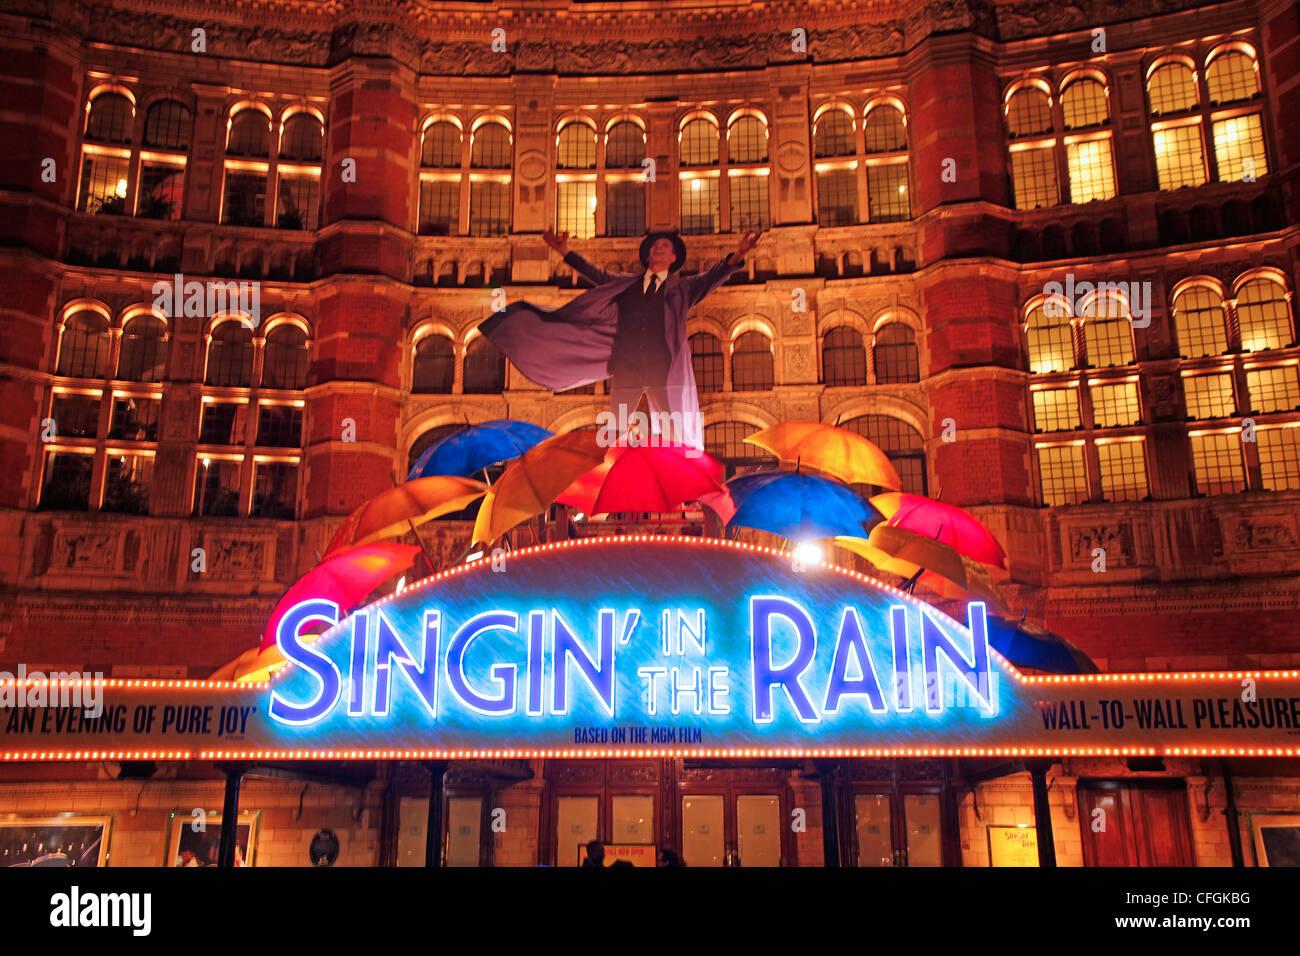 singing in the rain musical